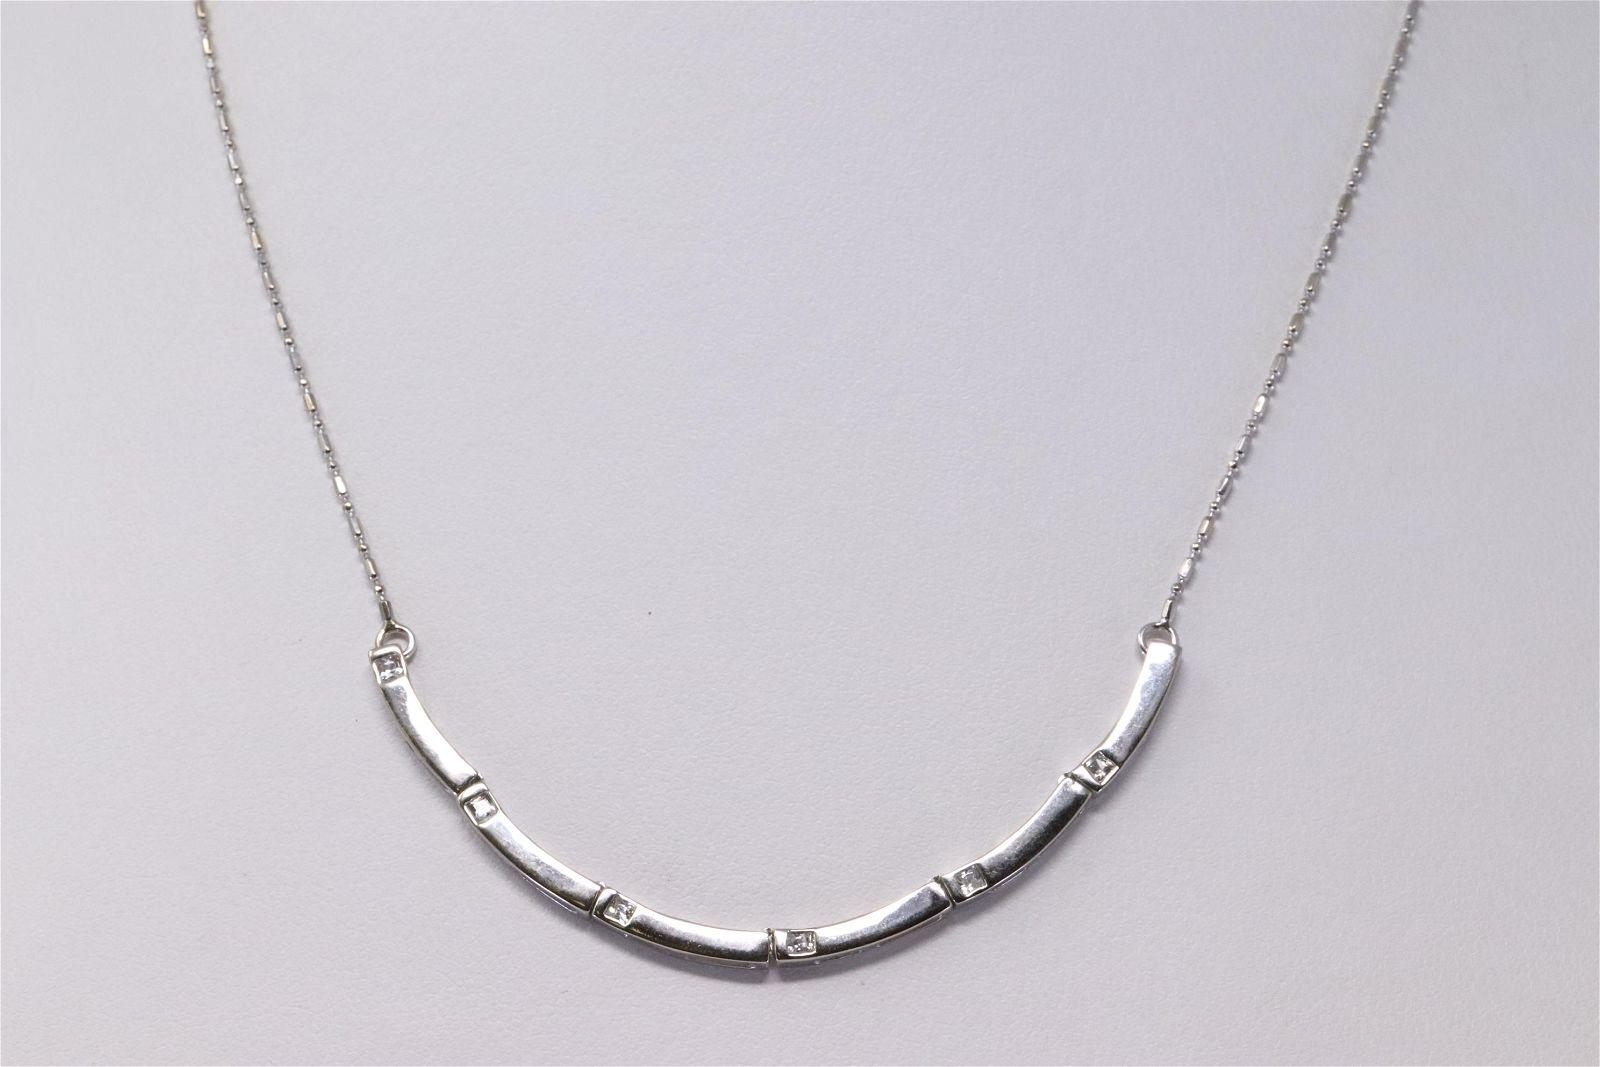 18Kt White Gold Diamond Necklace.